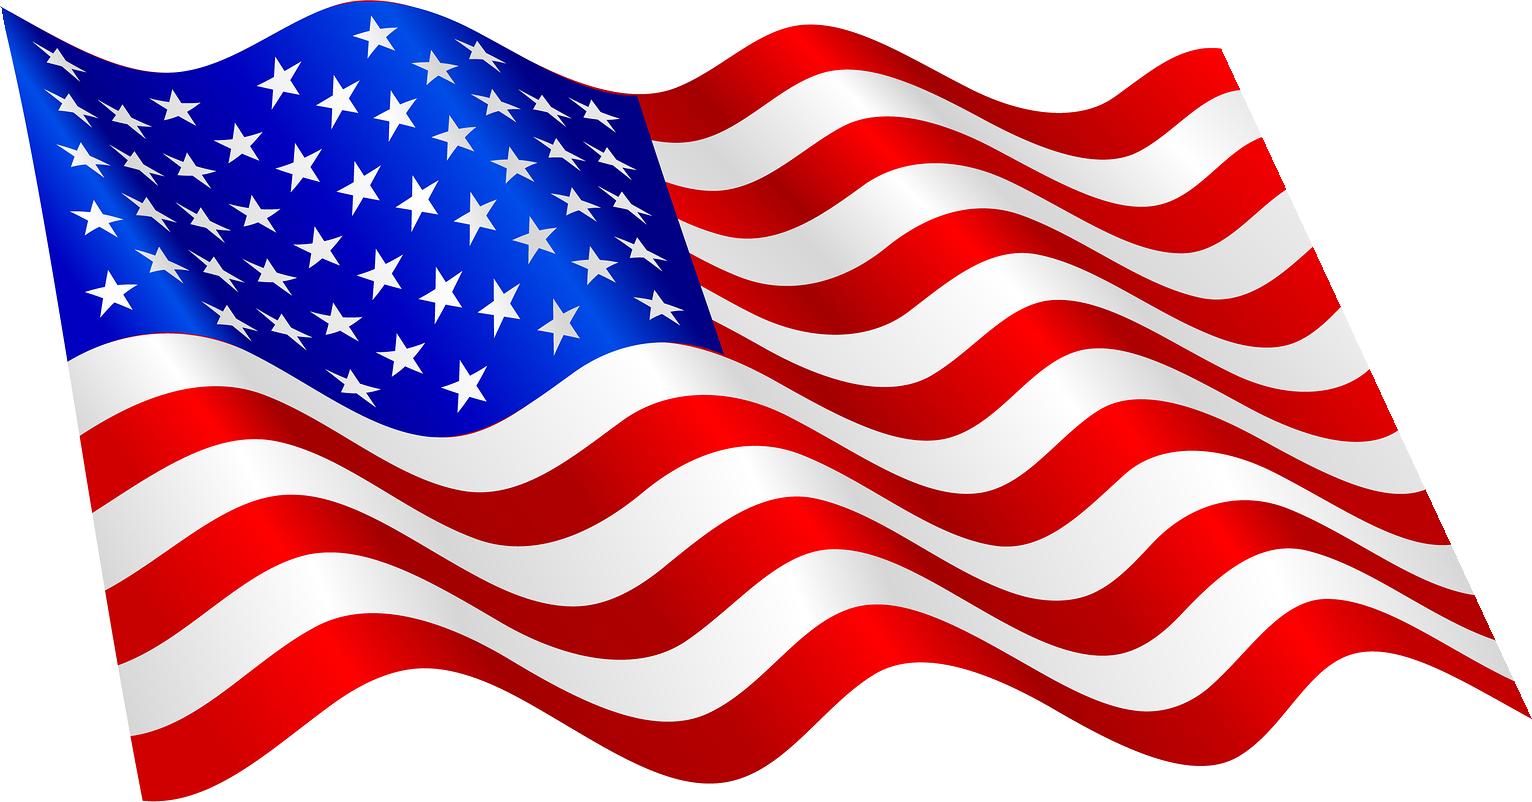 american flag png image purepng free transparent cc0 png image rh purepng com